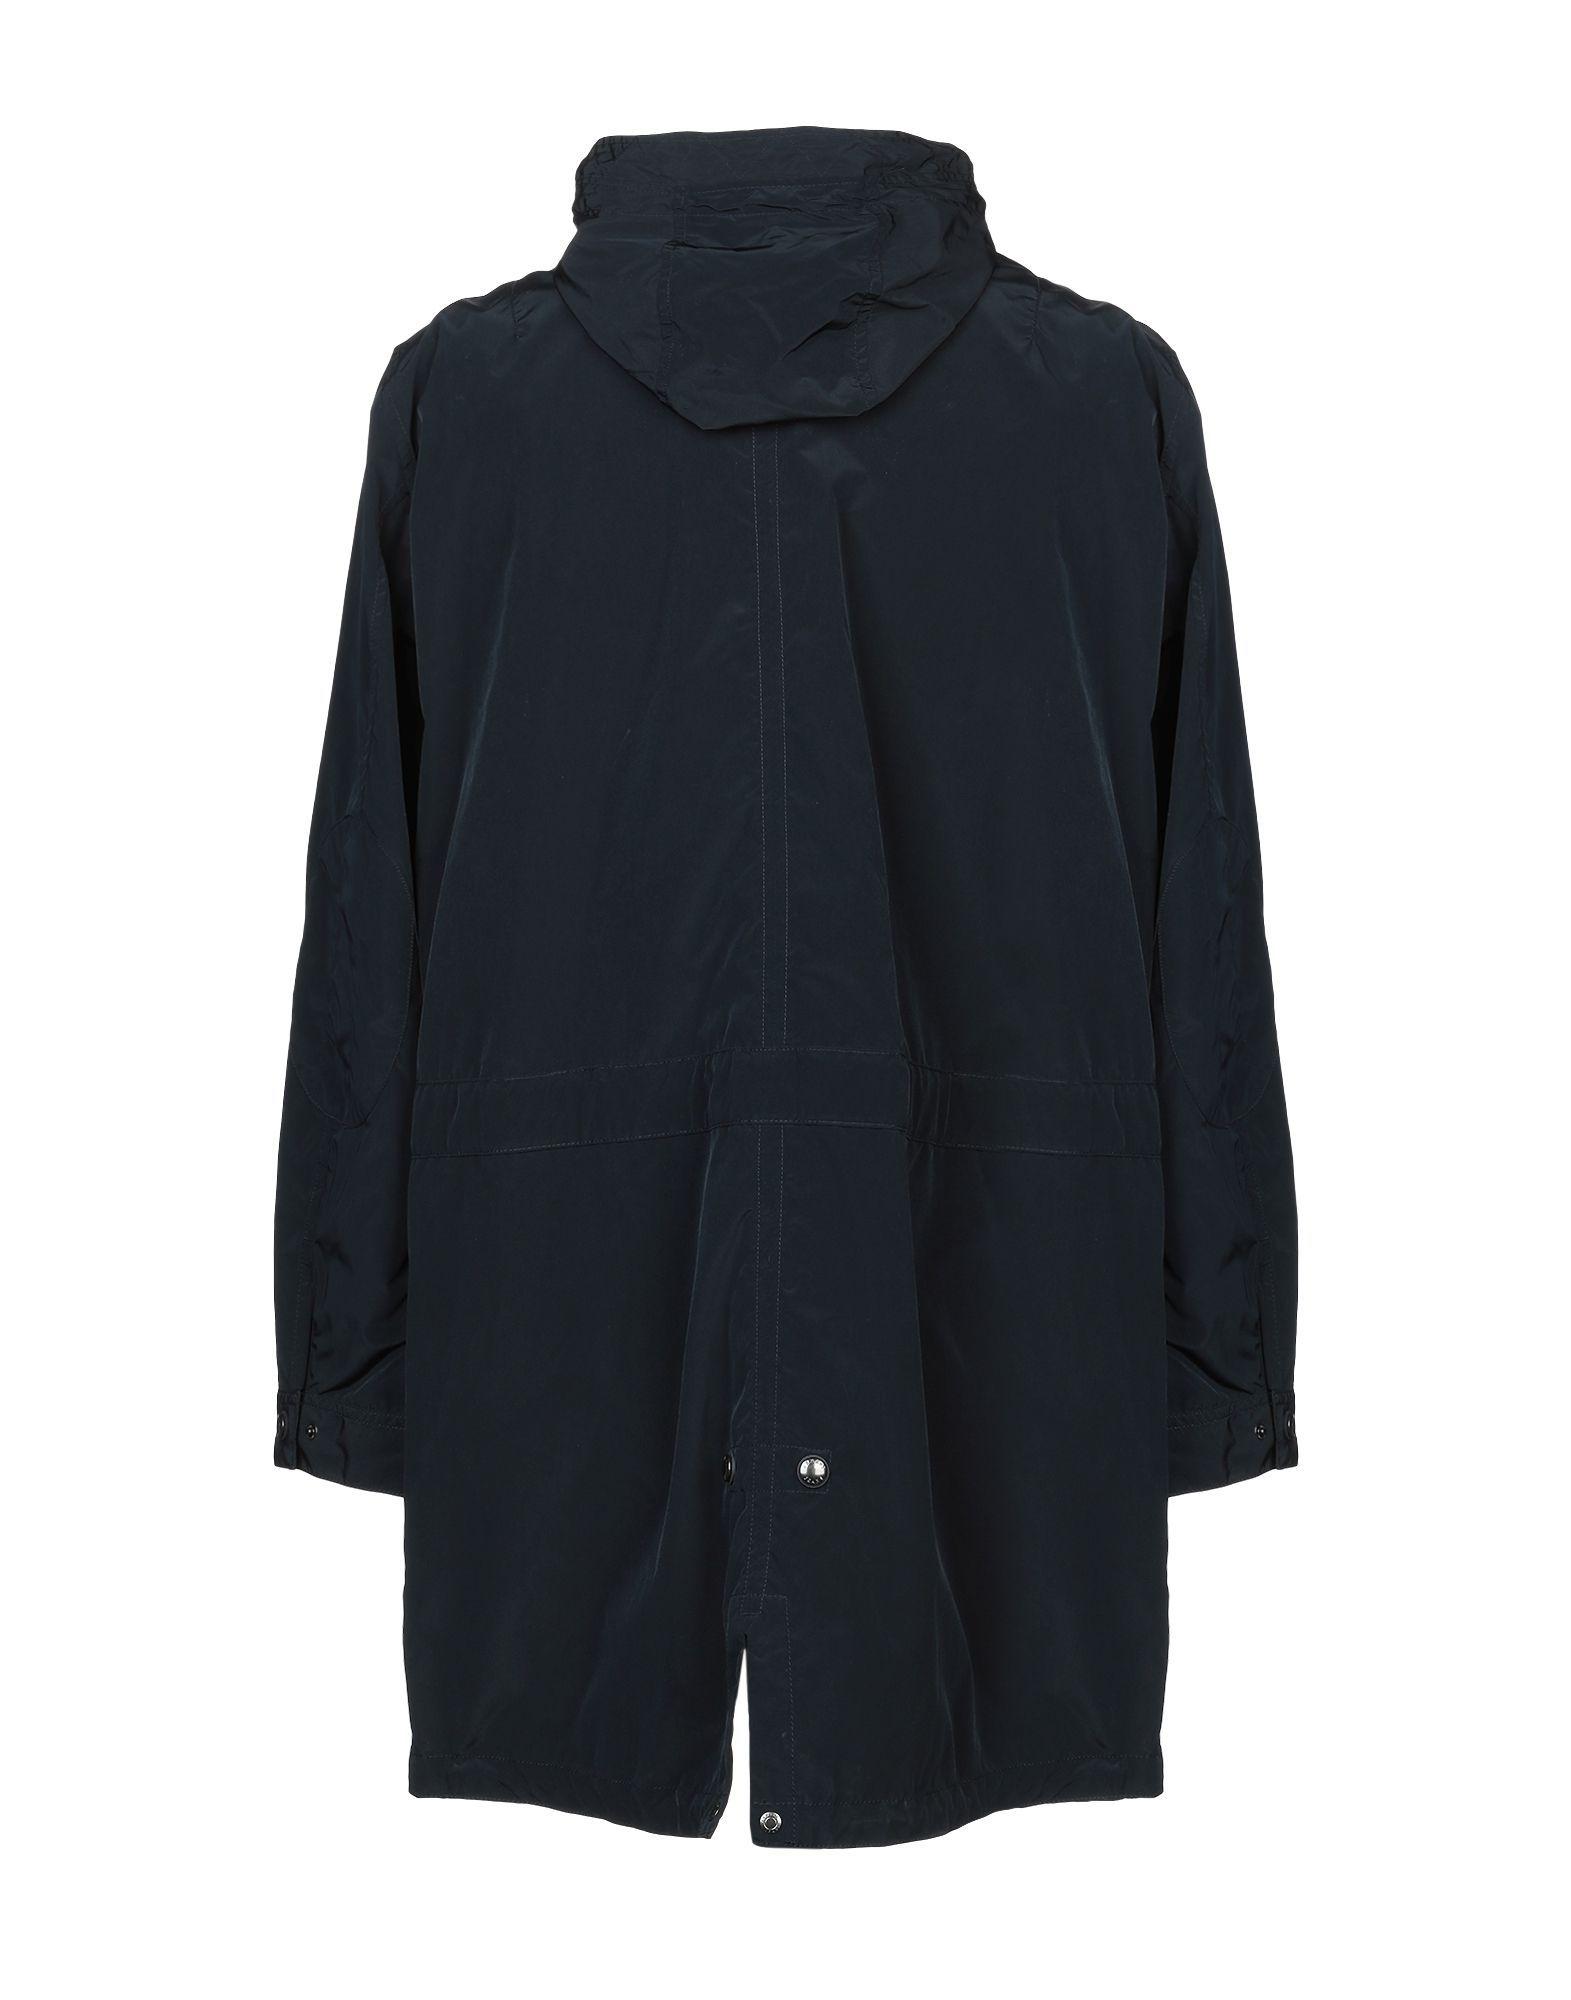 COATS & JACKETS Man Armani Jeans Dark blue Polyester